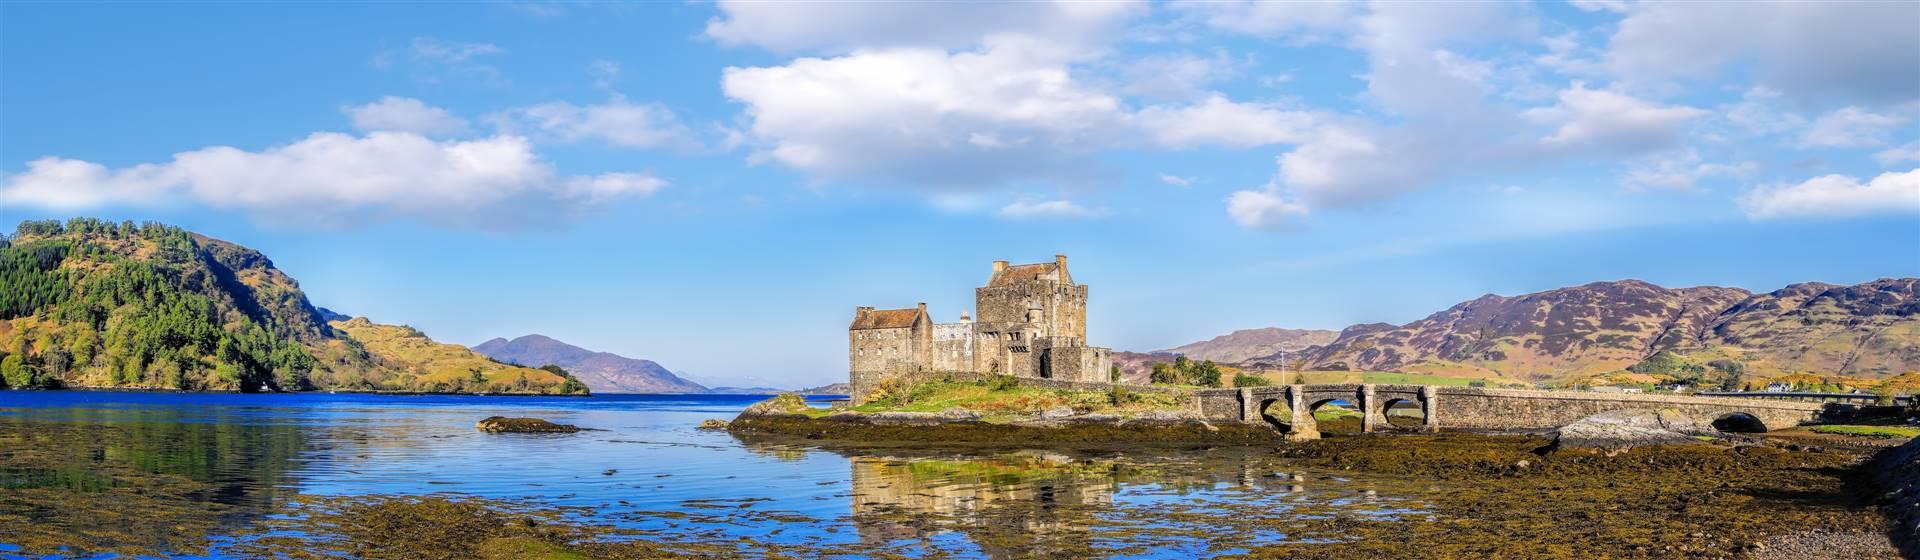 "<img src=""gtbruk-shutterstock.jpeg"" alt=""Eilean Donan Castle in Highlands of Scotland""/>"